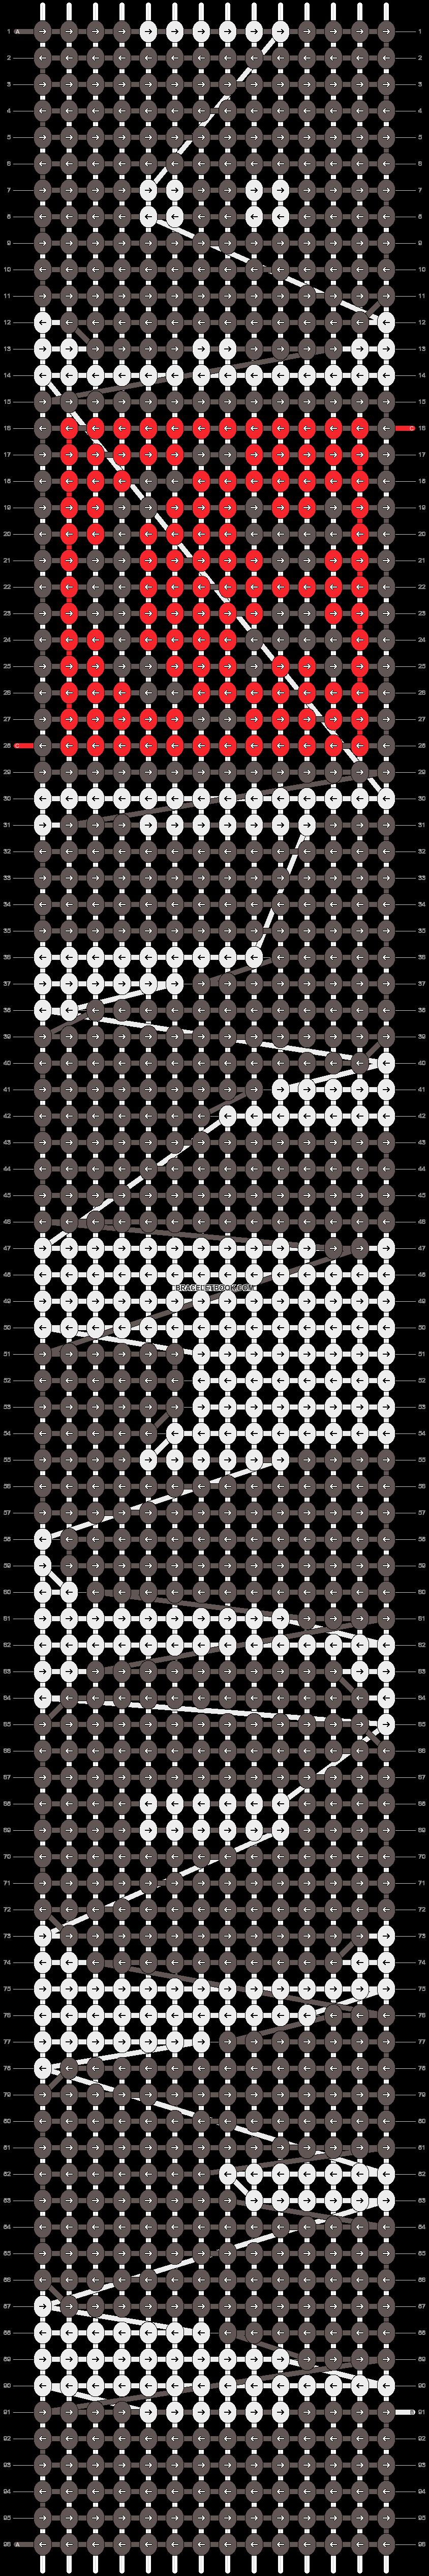 Alpha pattern #8175 pattern